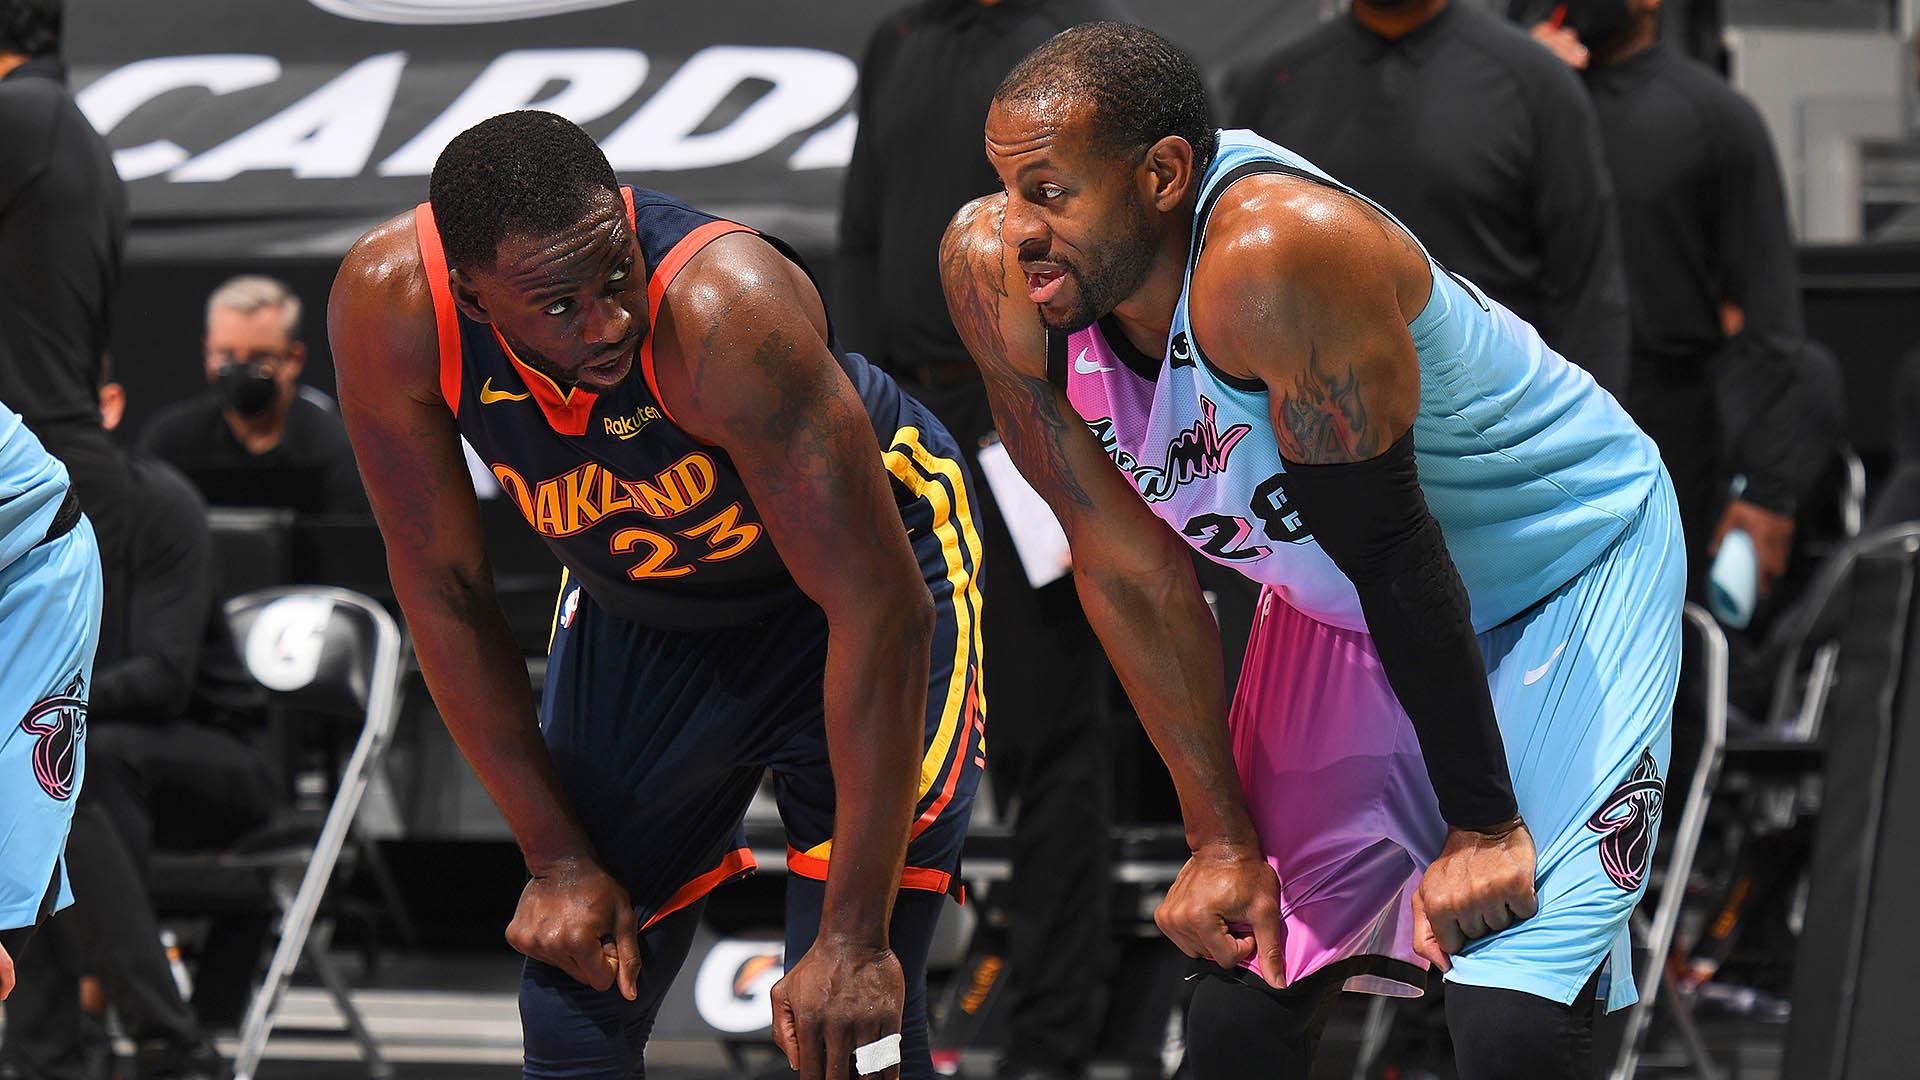 Andre Iguodala returns to Warriors on 1-year deal